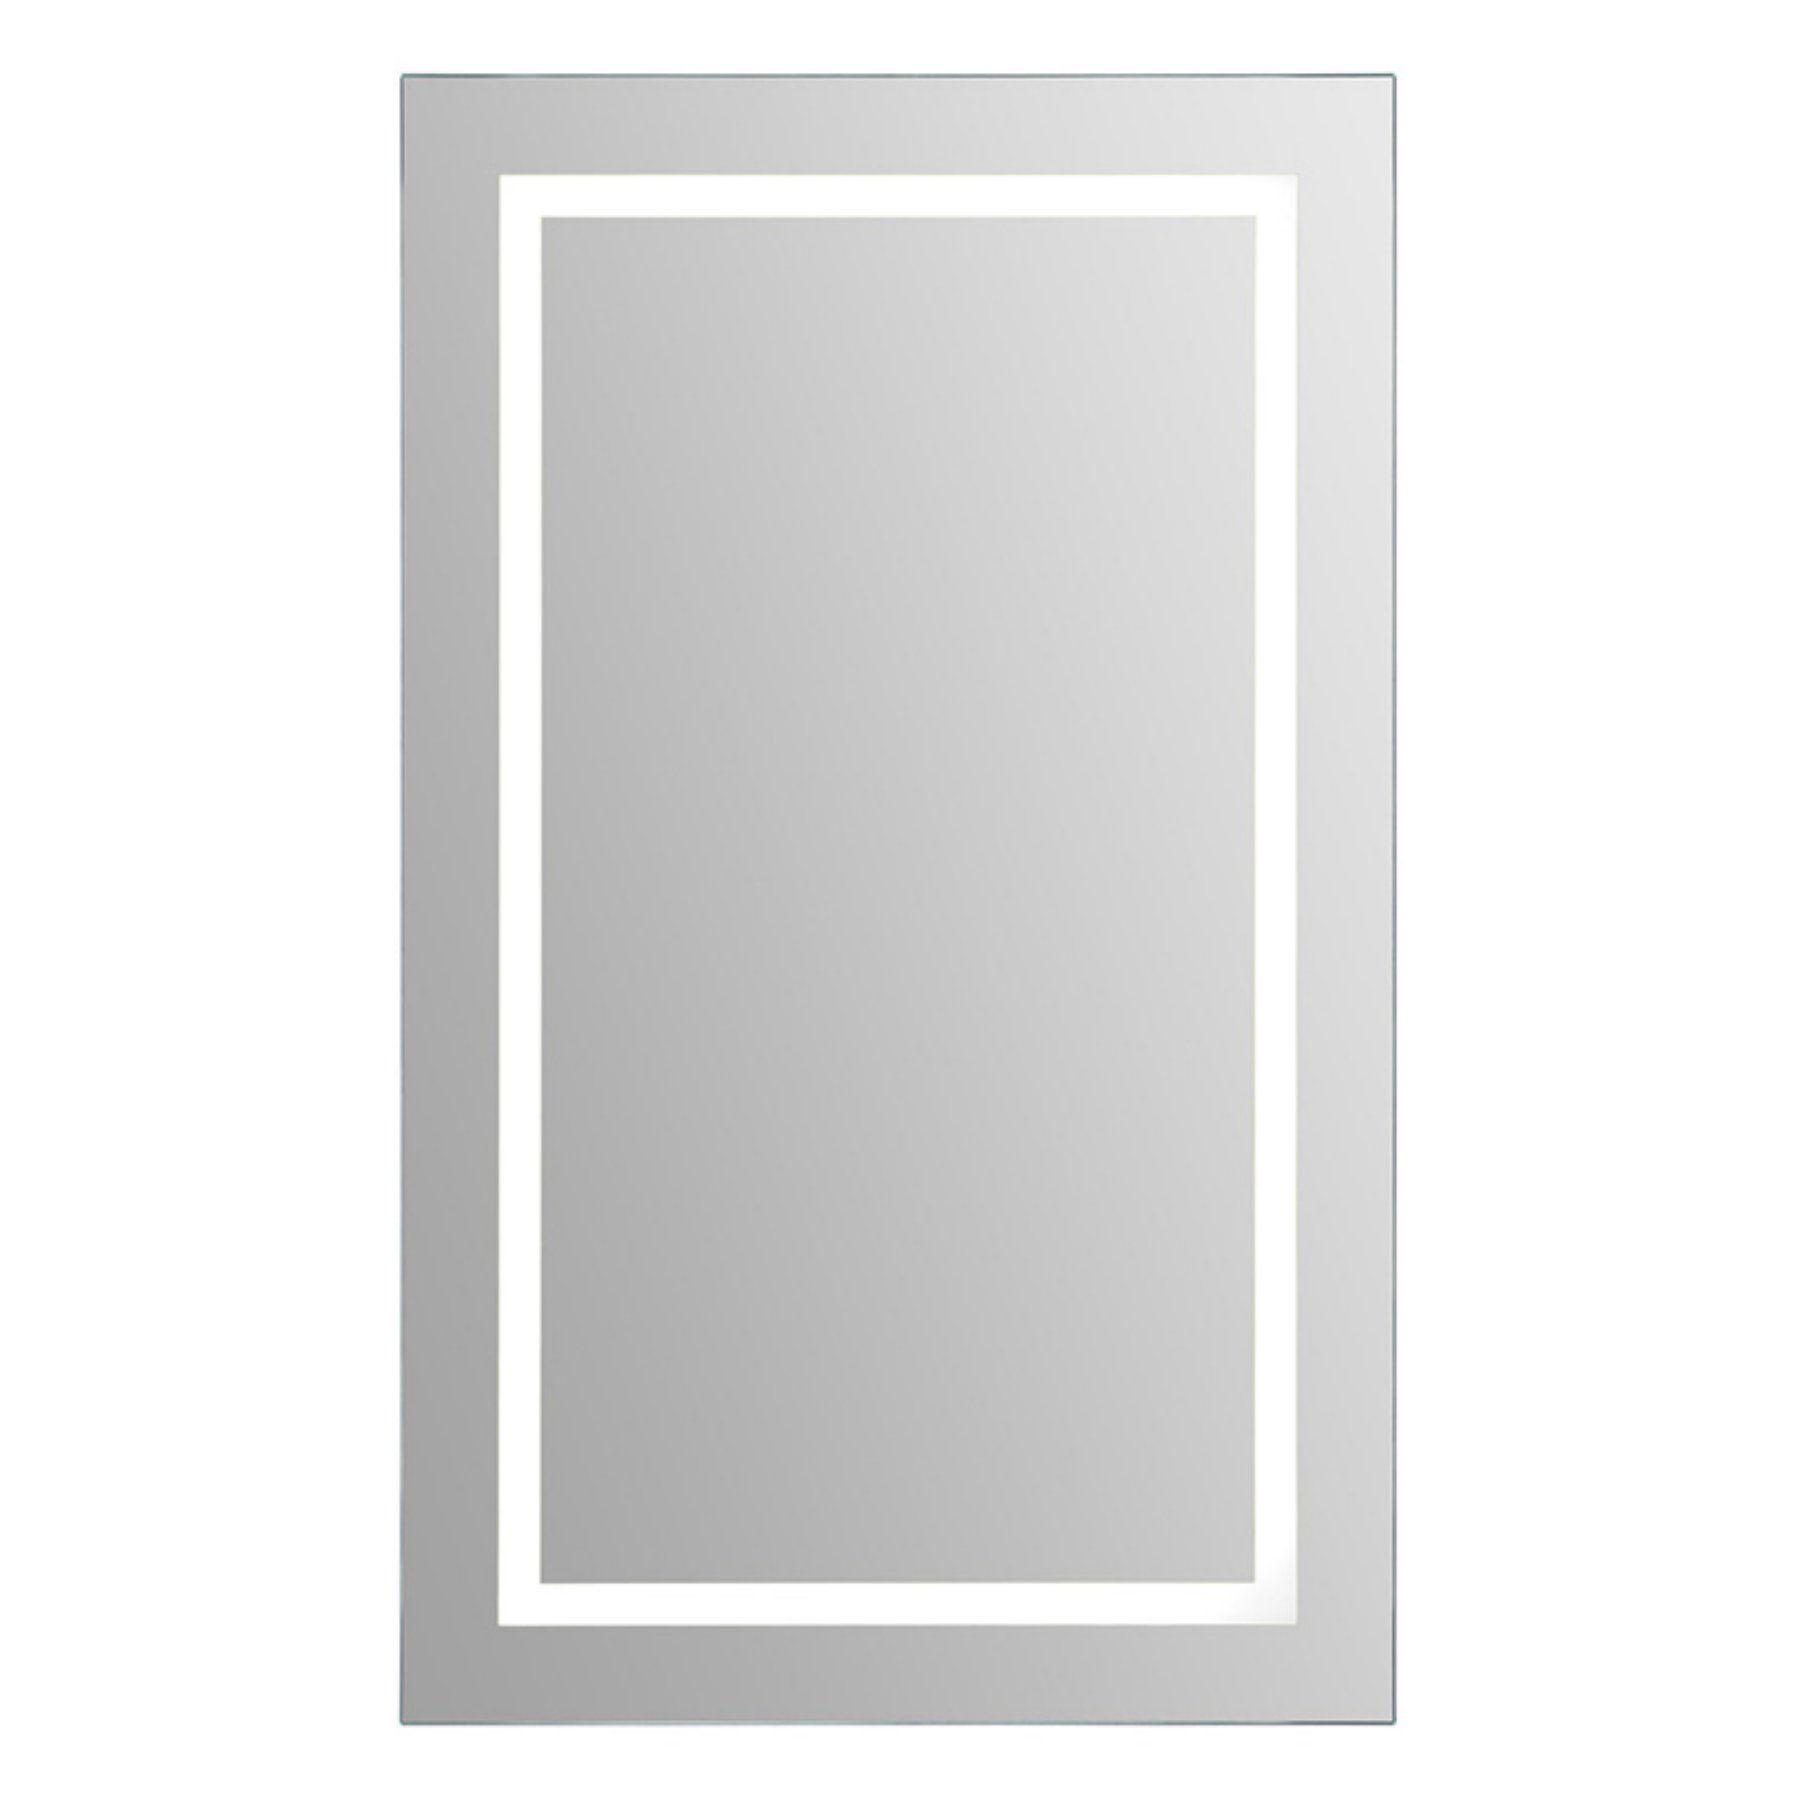 ren wil rectangular led wall mirror 24w x 40h in led mirror frames on wall rectangular mirror ren wil rectangular led wall mirror